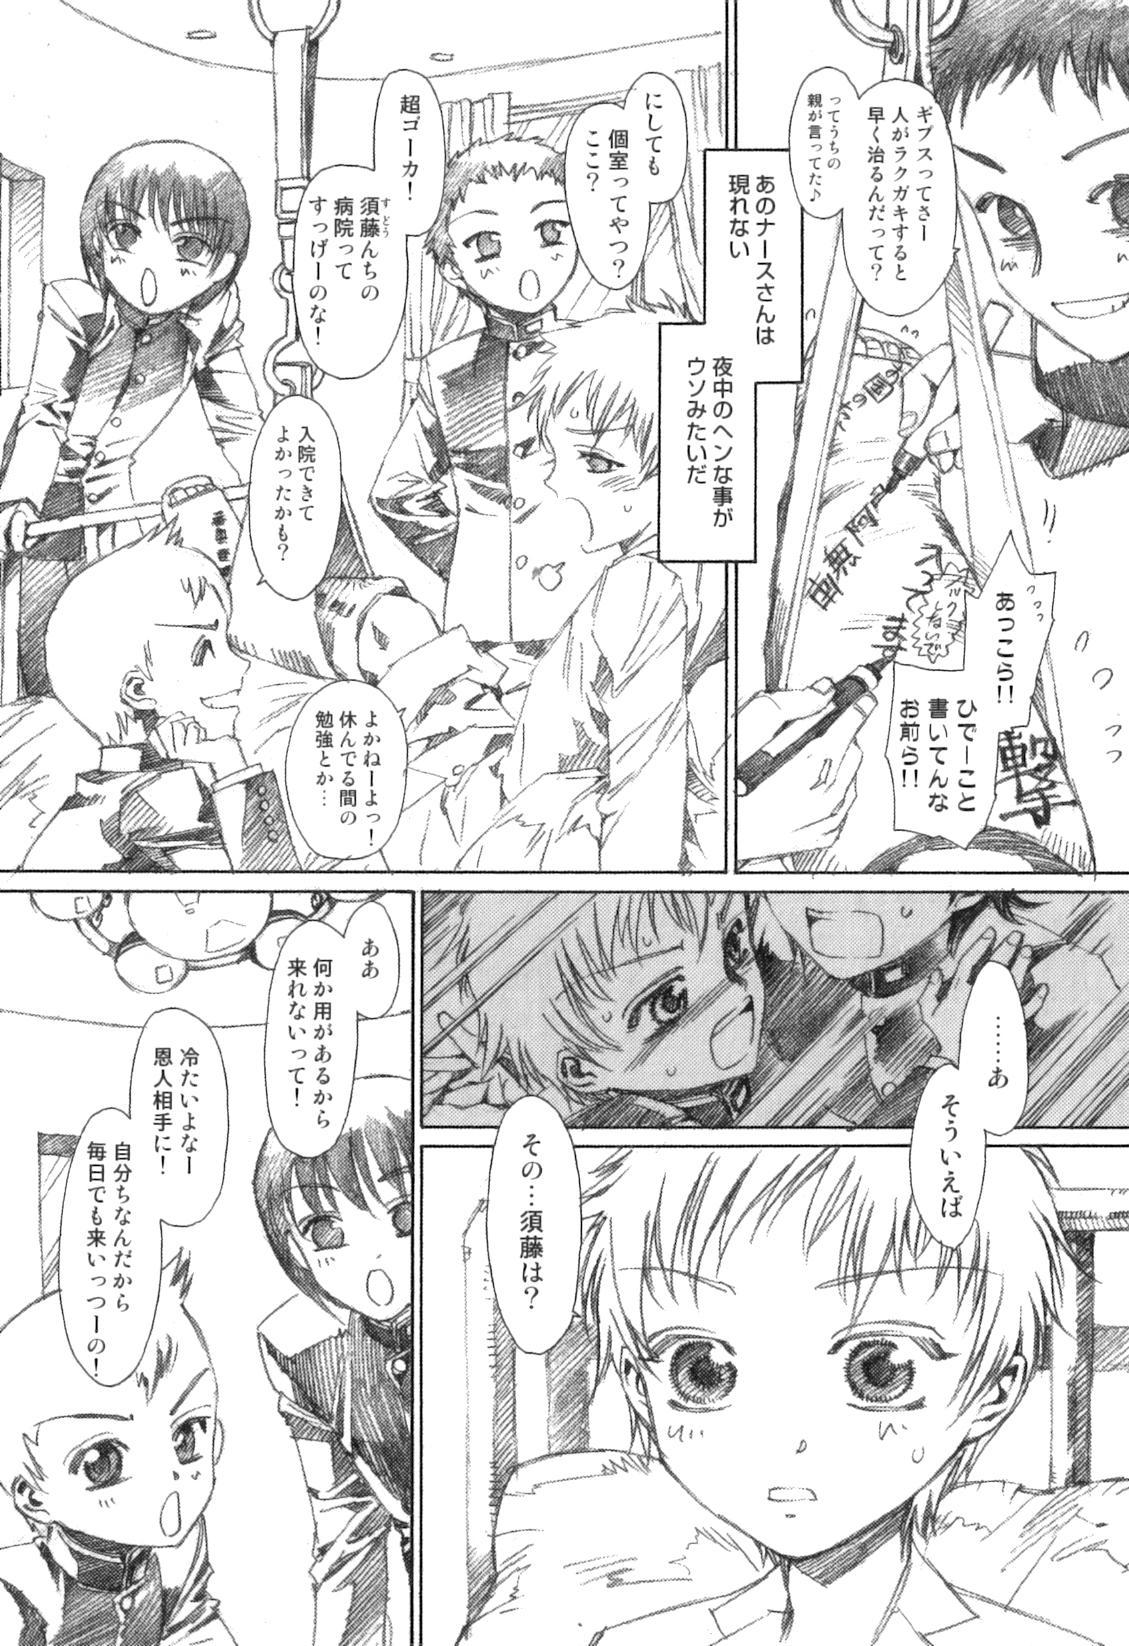 Yuni-Hapi 94